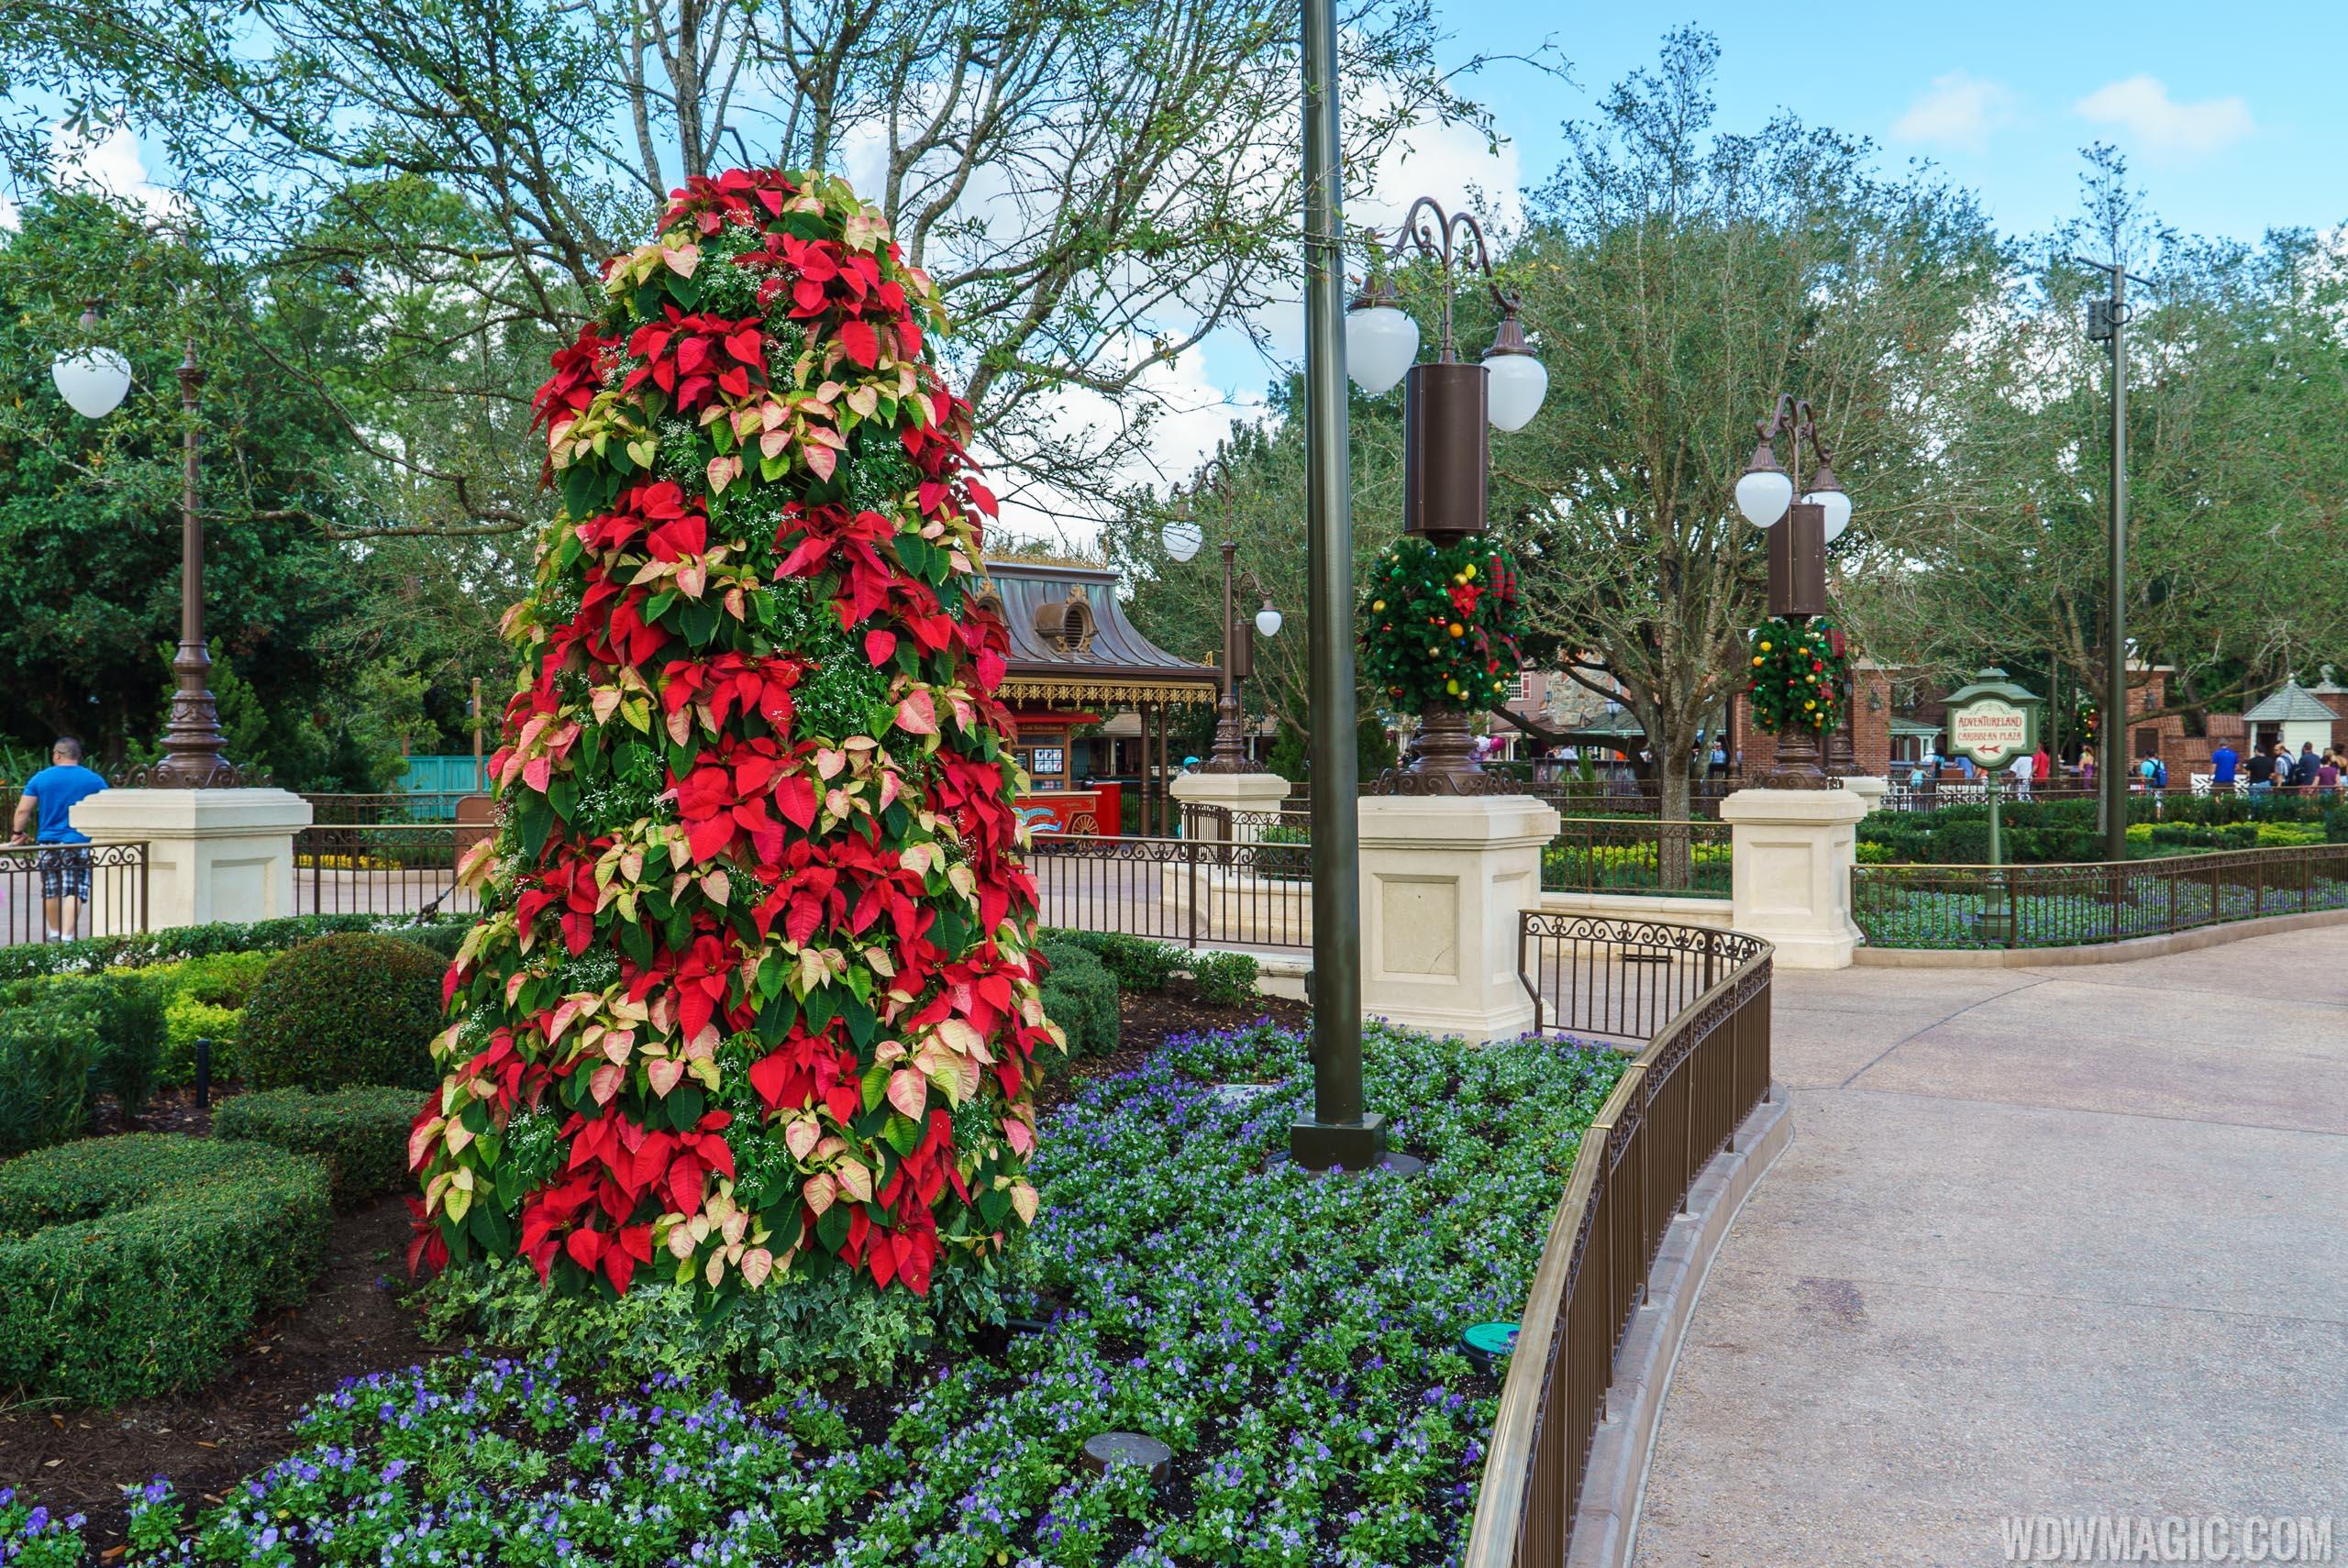 Holidays decorations at the Magic Kingdom 2015